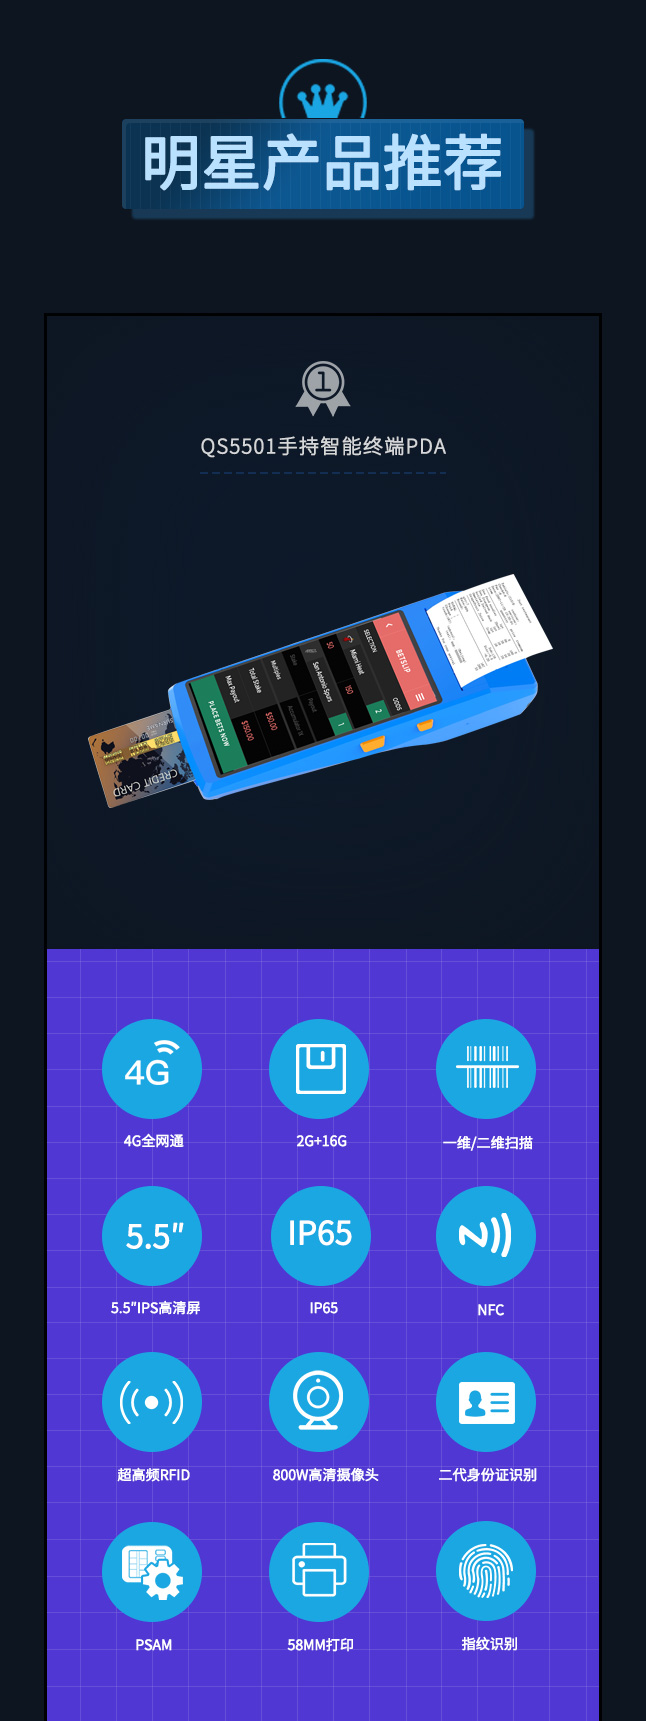 ISRE2019 智慧零售展 無人售貨展 移動支付 智能手持設備  群索科技